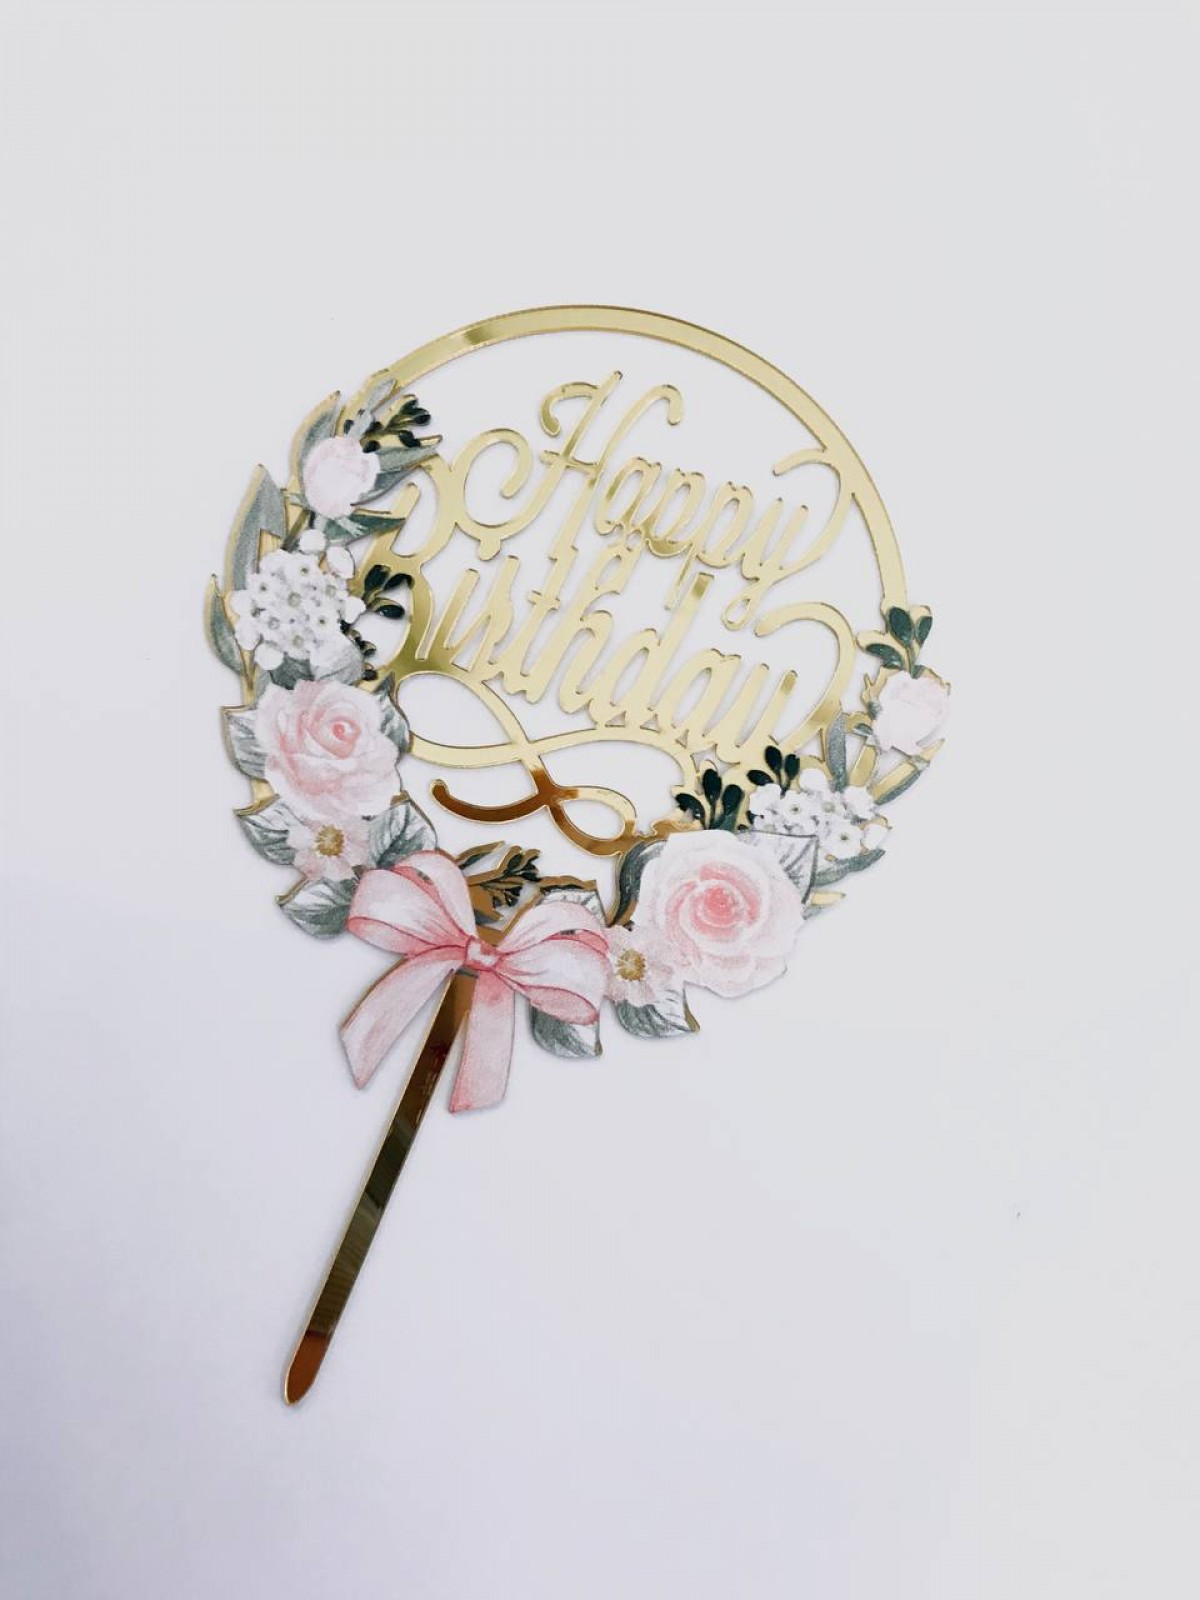 TOPPER HAPPY BIRTHDAY (SOFT PINK FLOWERS) - RARA KITCHY